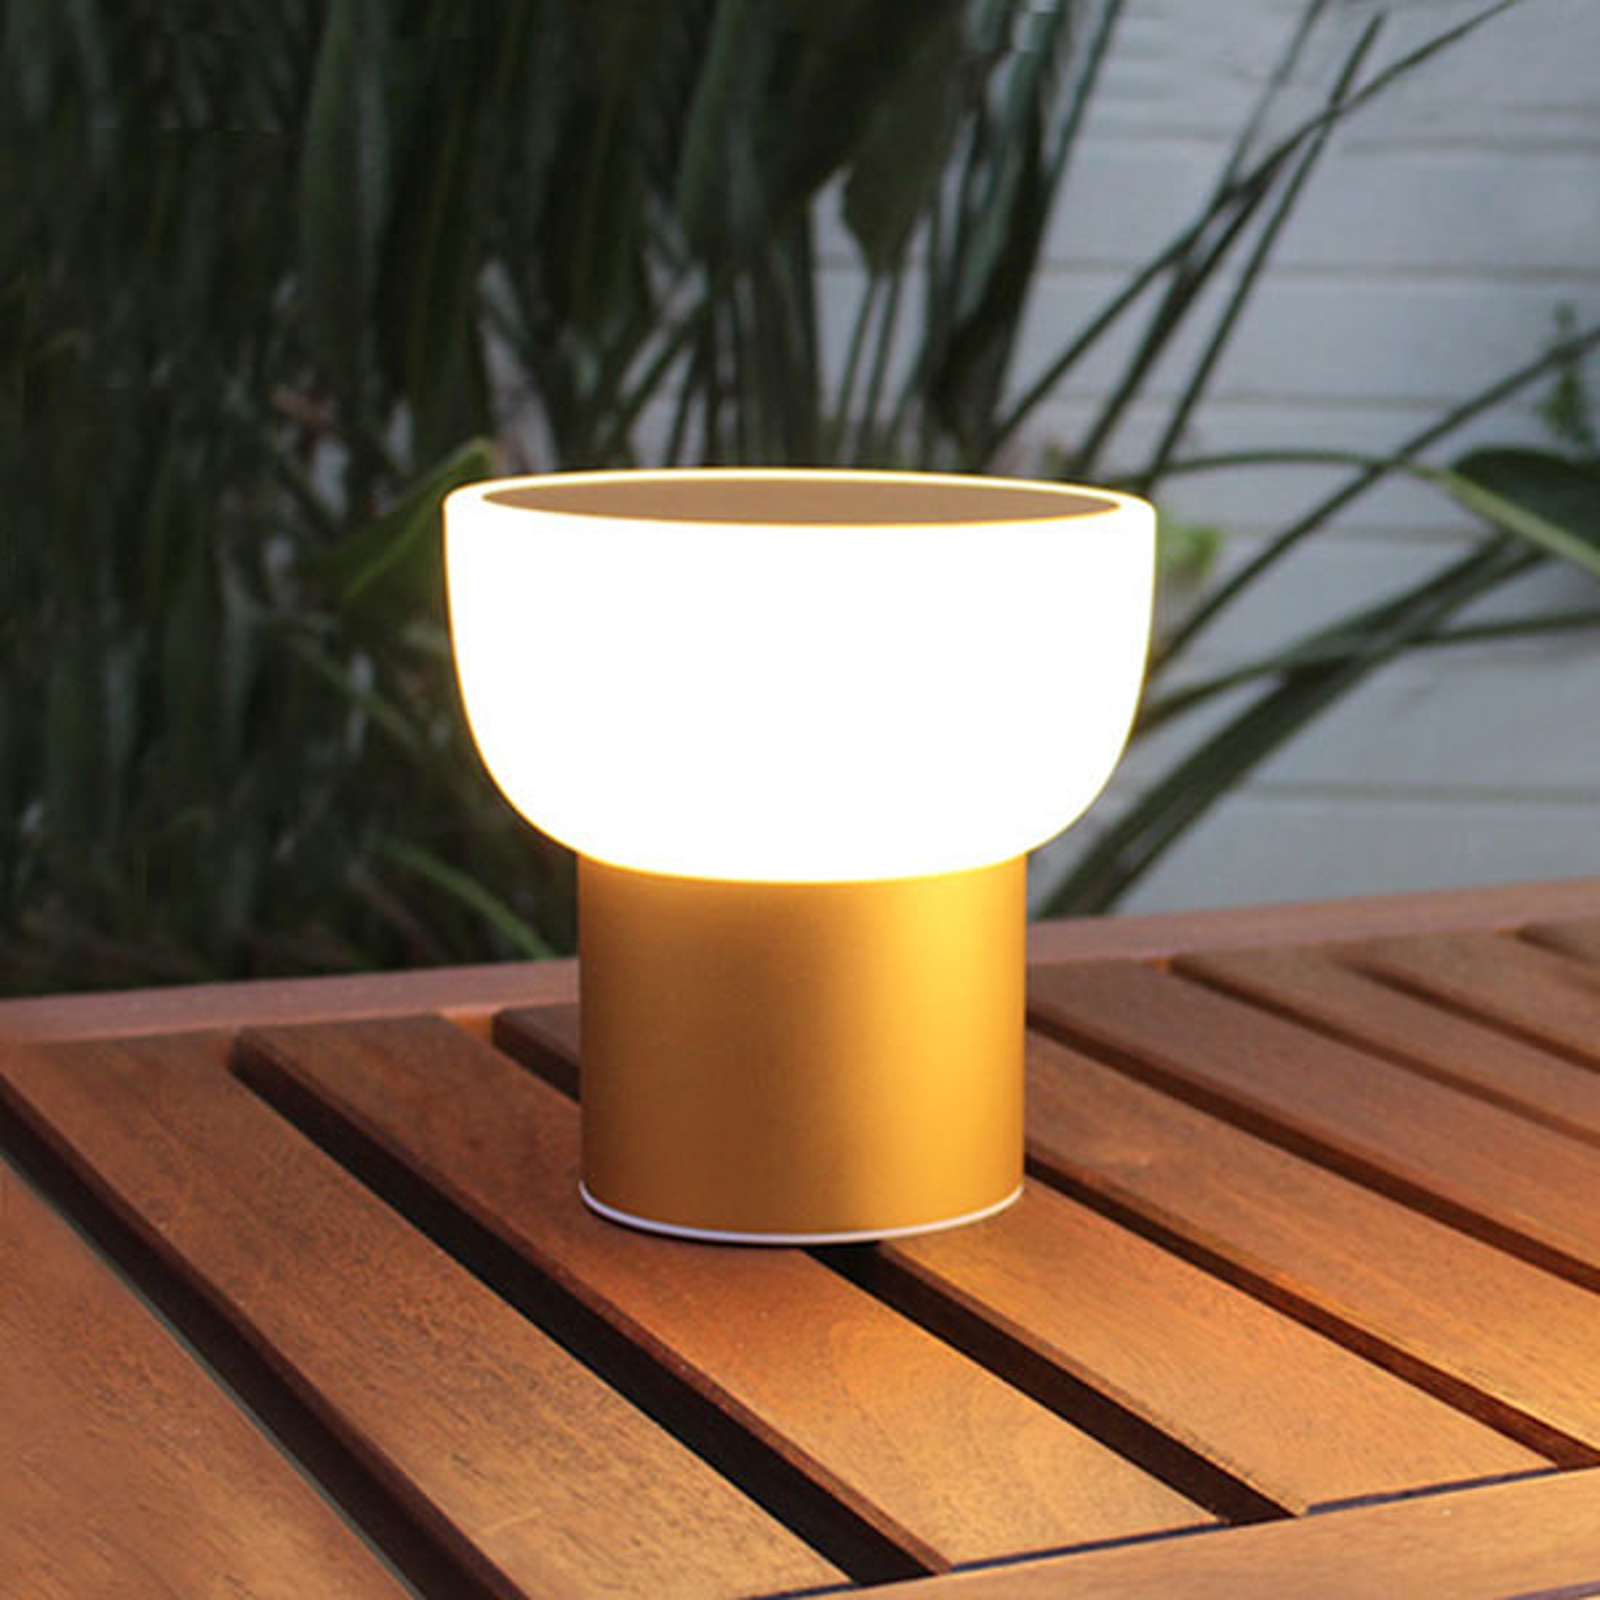 LED-Außendekoleuchte Patio, gold, 16 cm 6-fach USB